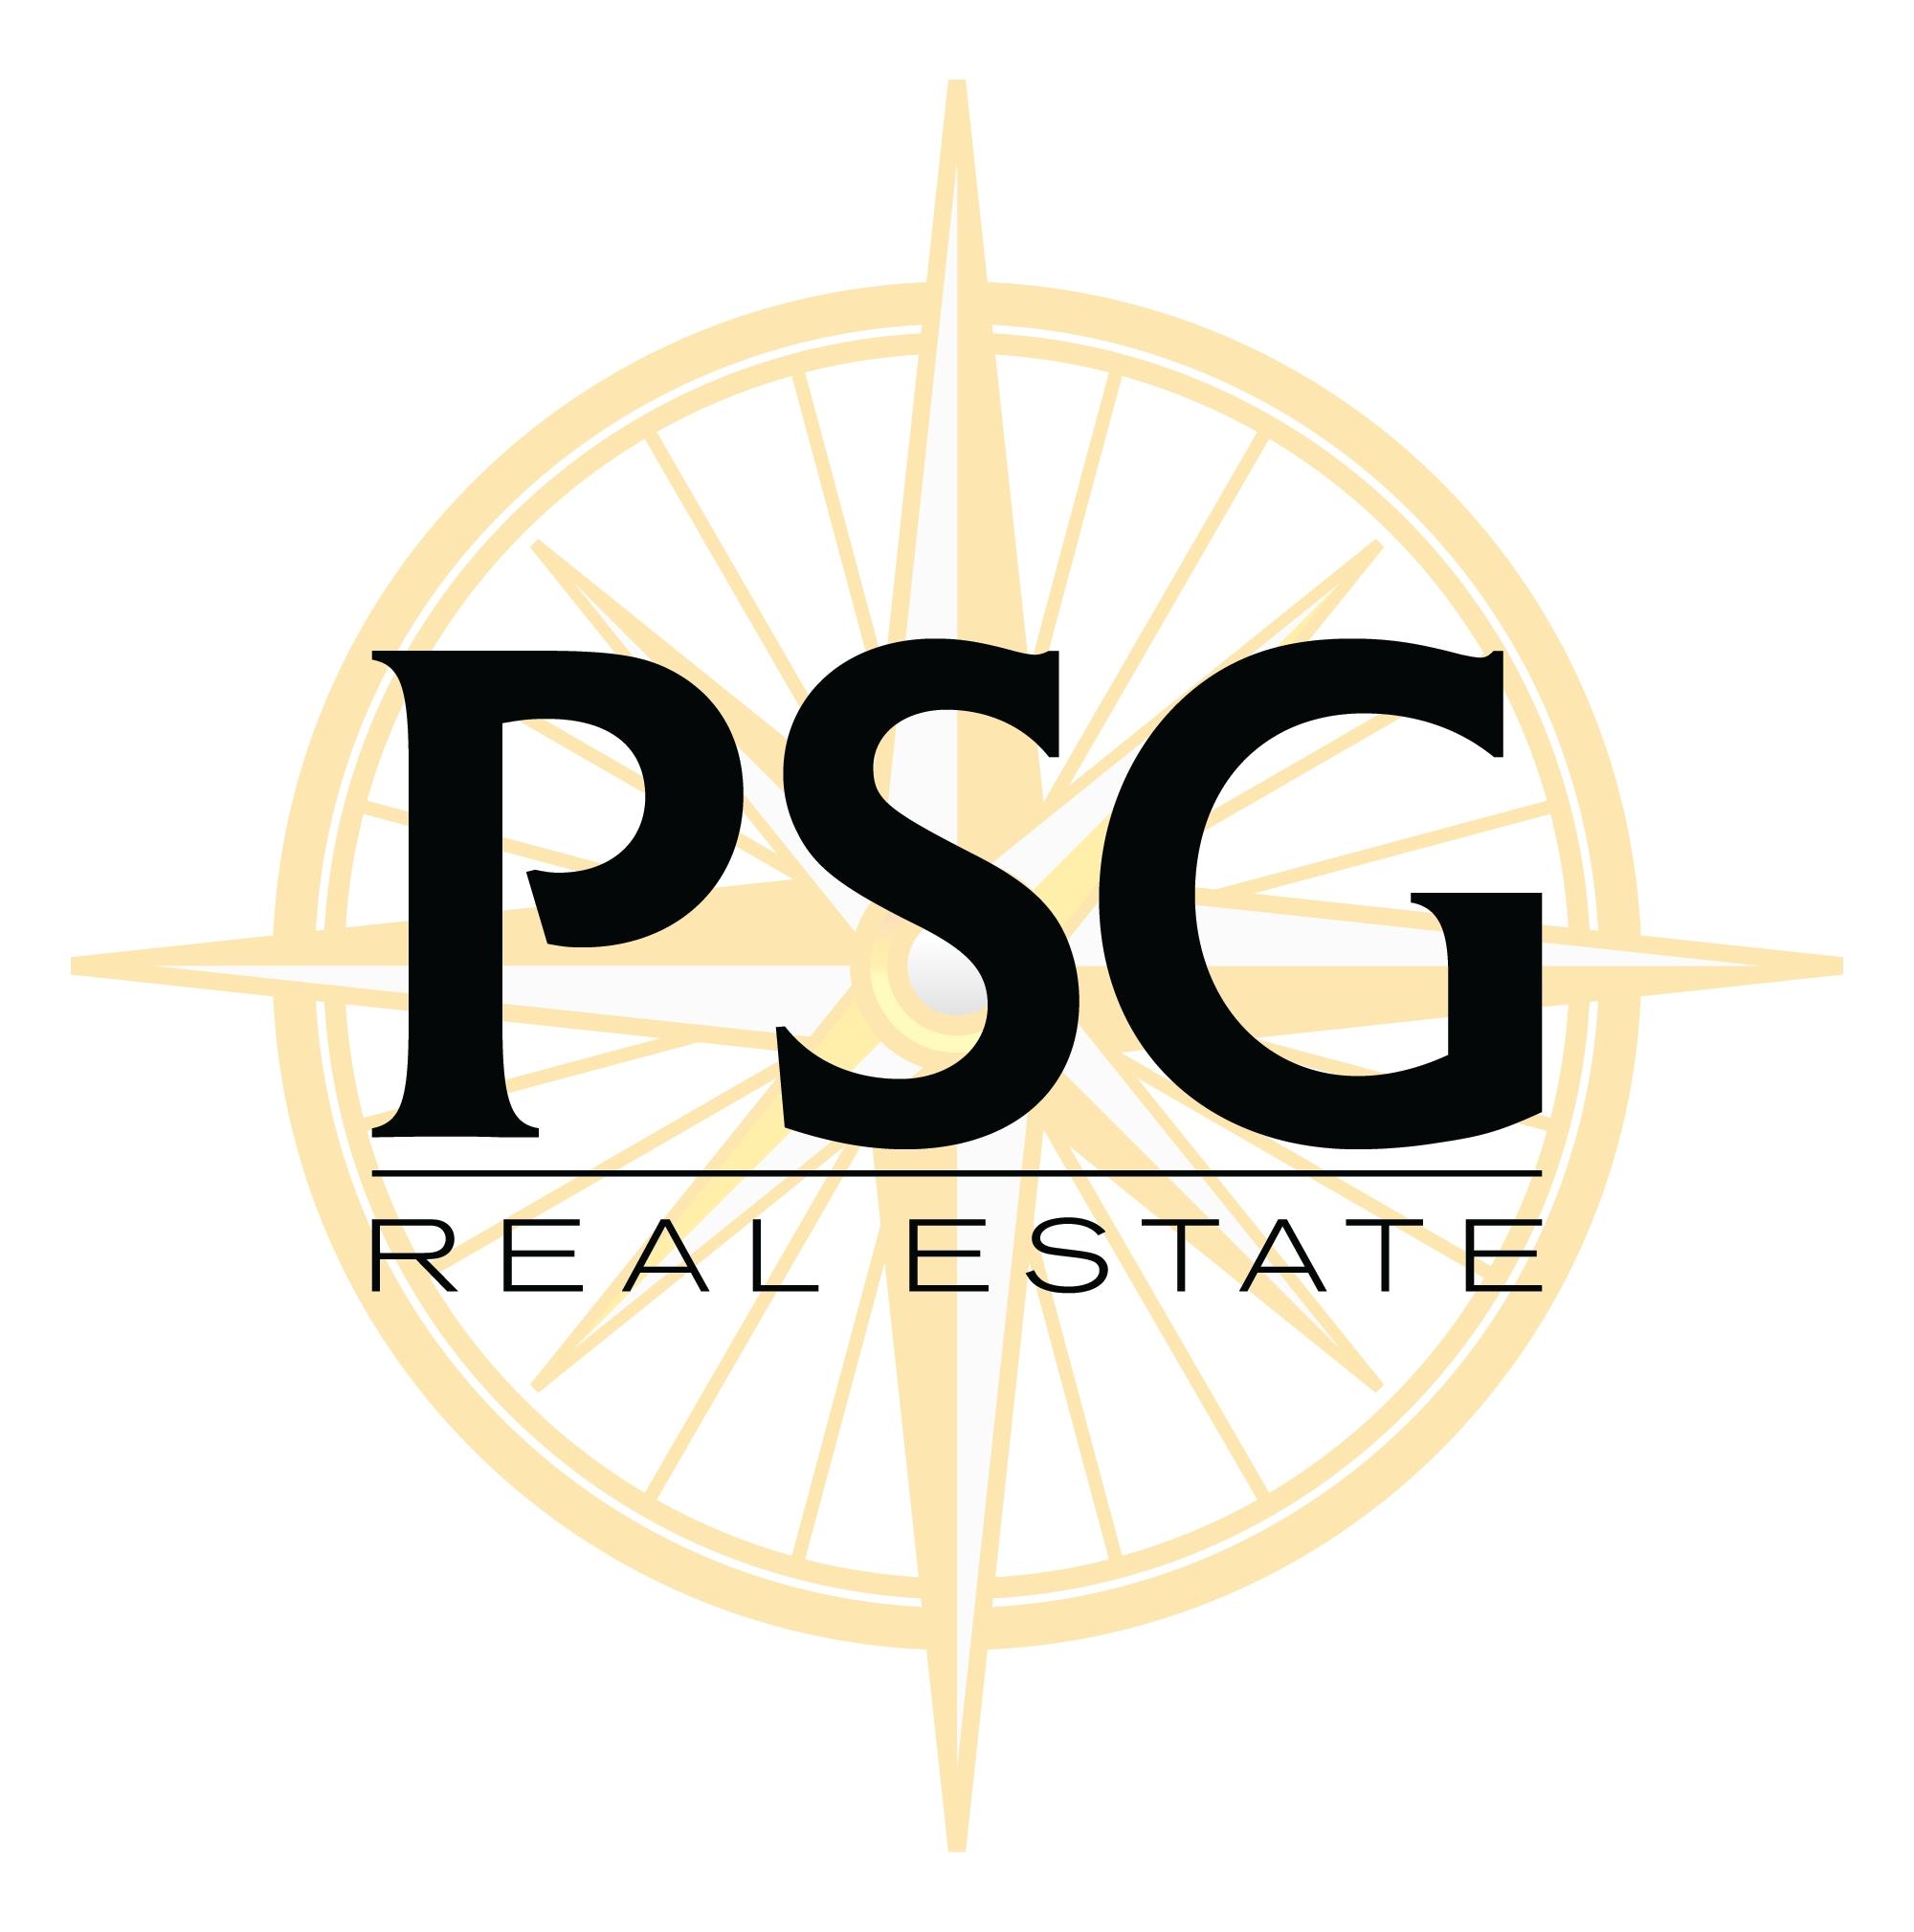 Karen Bayles - Point South Real Estate Logo